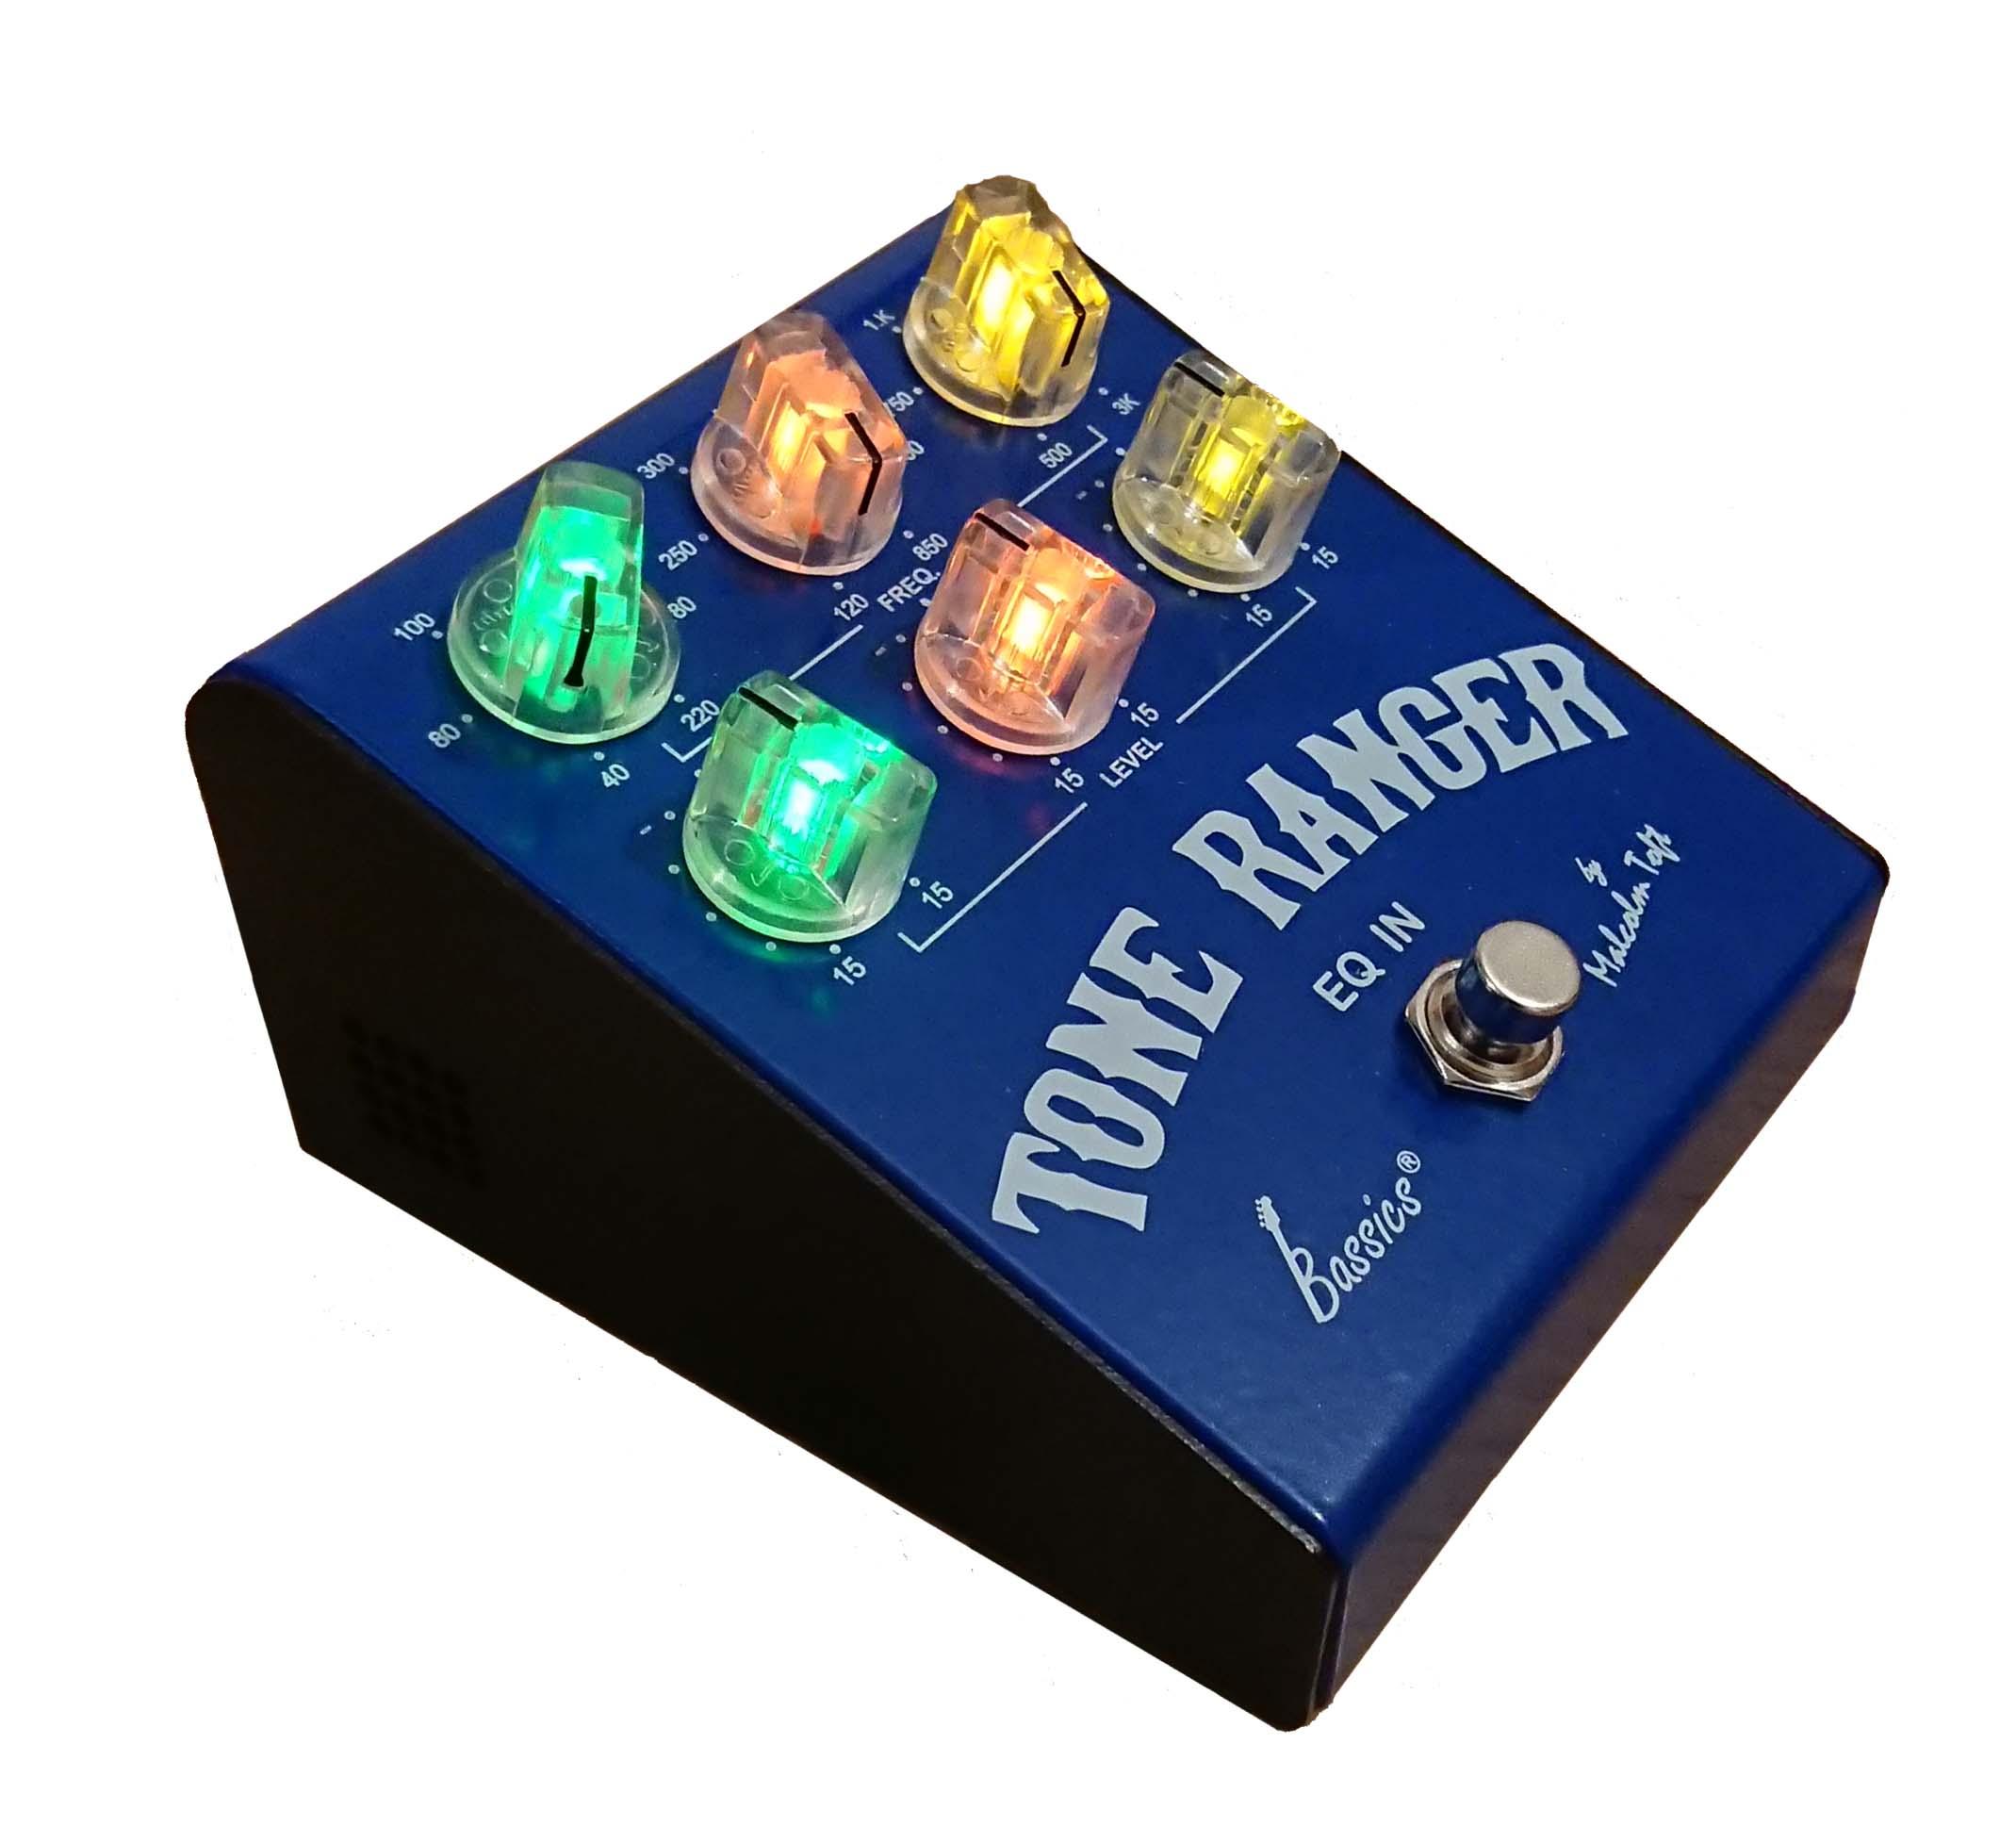 Bassics Tone Ranger Pre-Amp Pedal